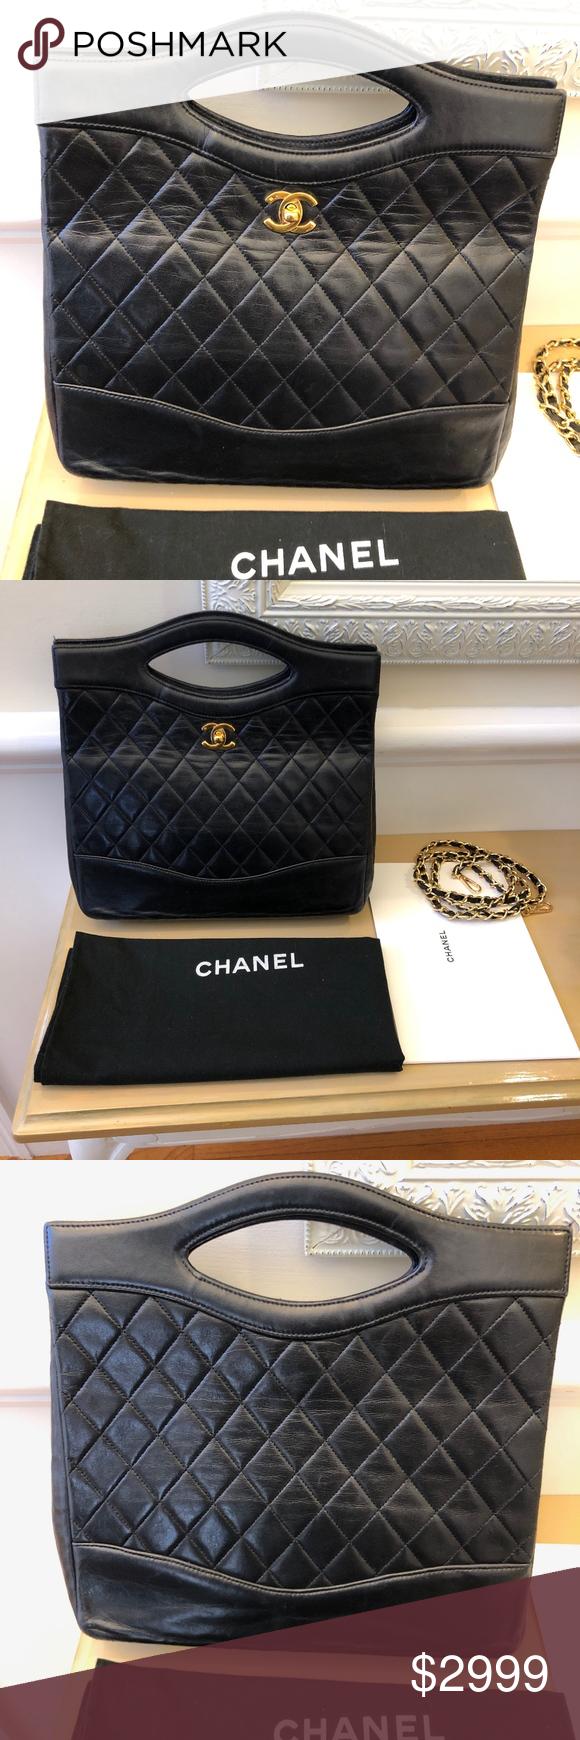 fe6193c8507a Chanel 31 Small Black calfskin Shopping Bag Chanel 31 Small Shopping bag  black Calfskin gold tone